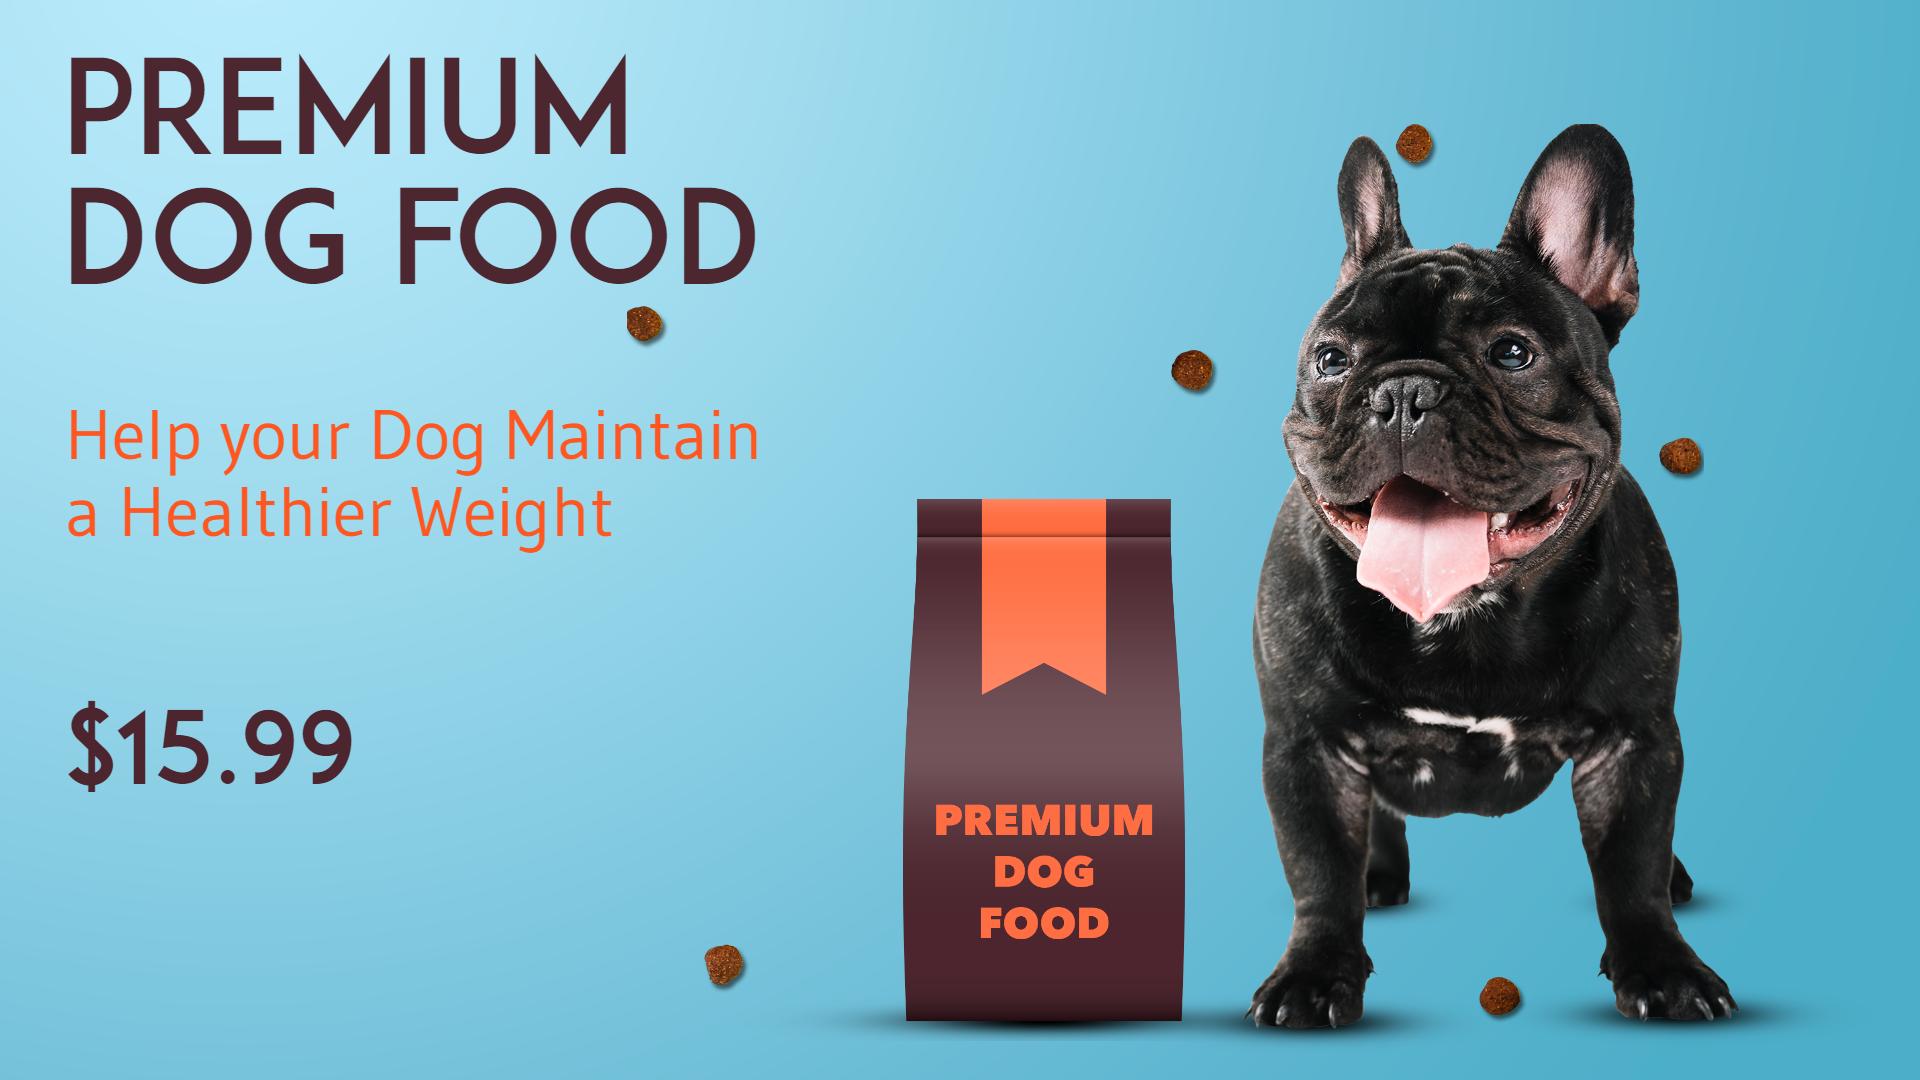 Dog Food Premium Pet Food Design  Template